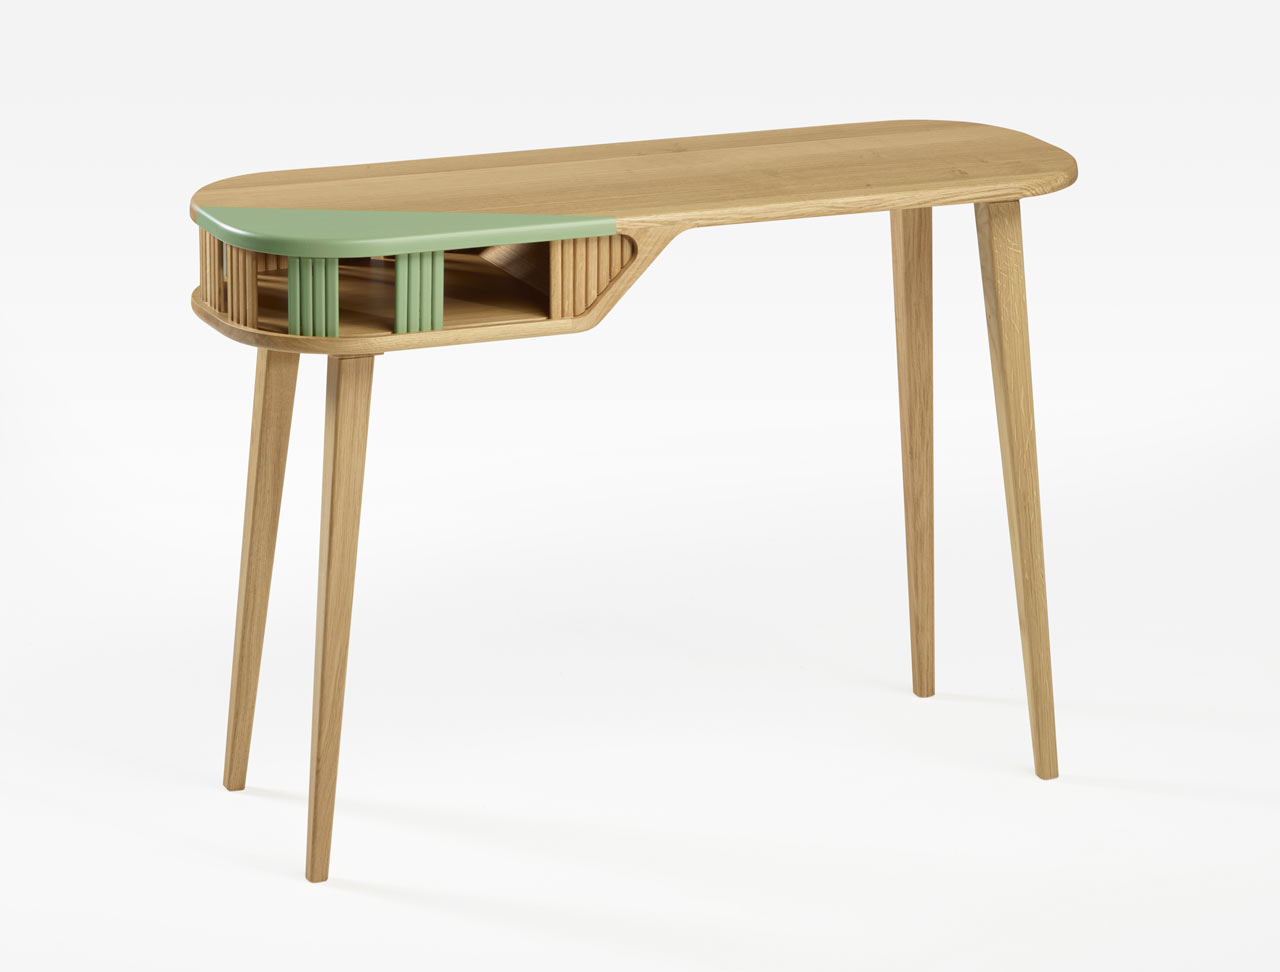 Julie-Gaillard-Latitude-Furniture-hisheji (6)